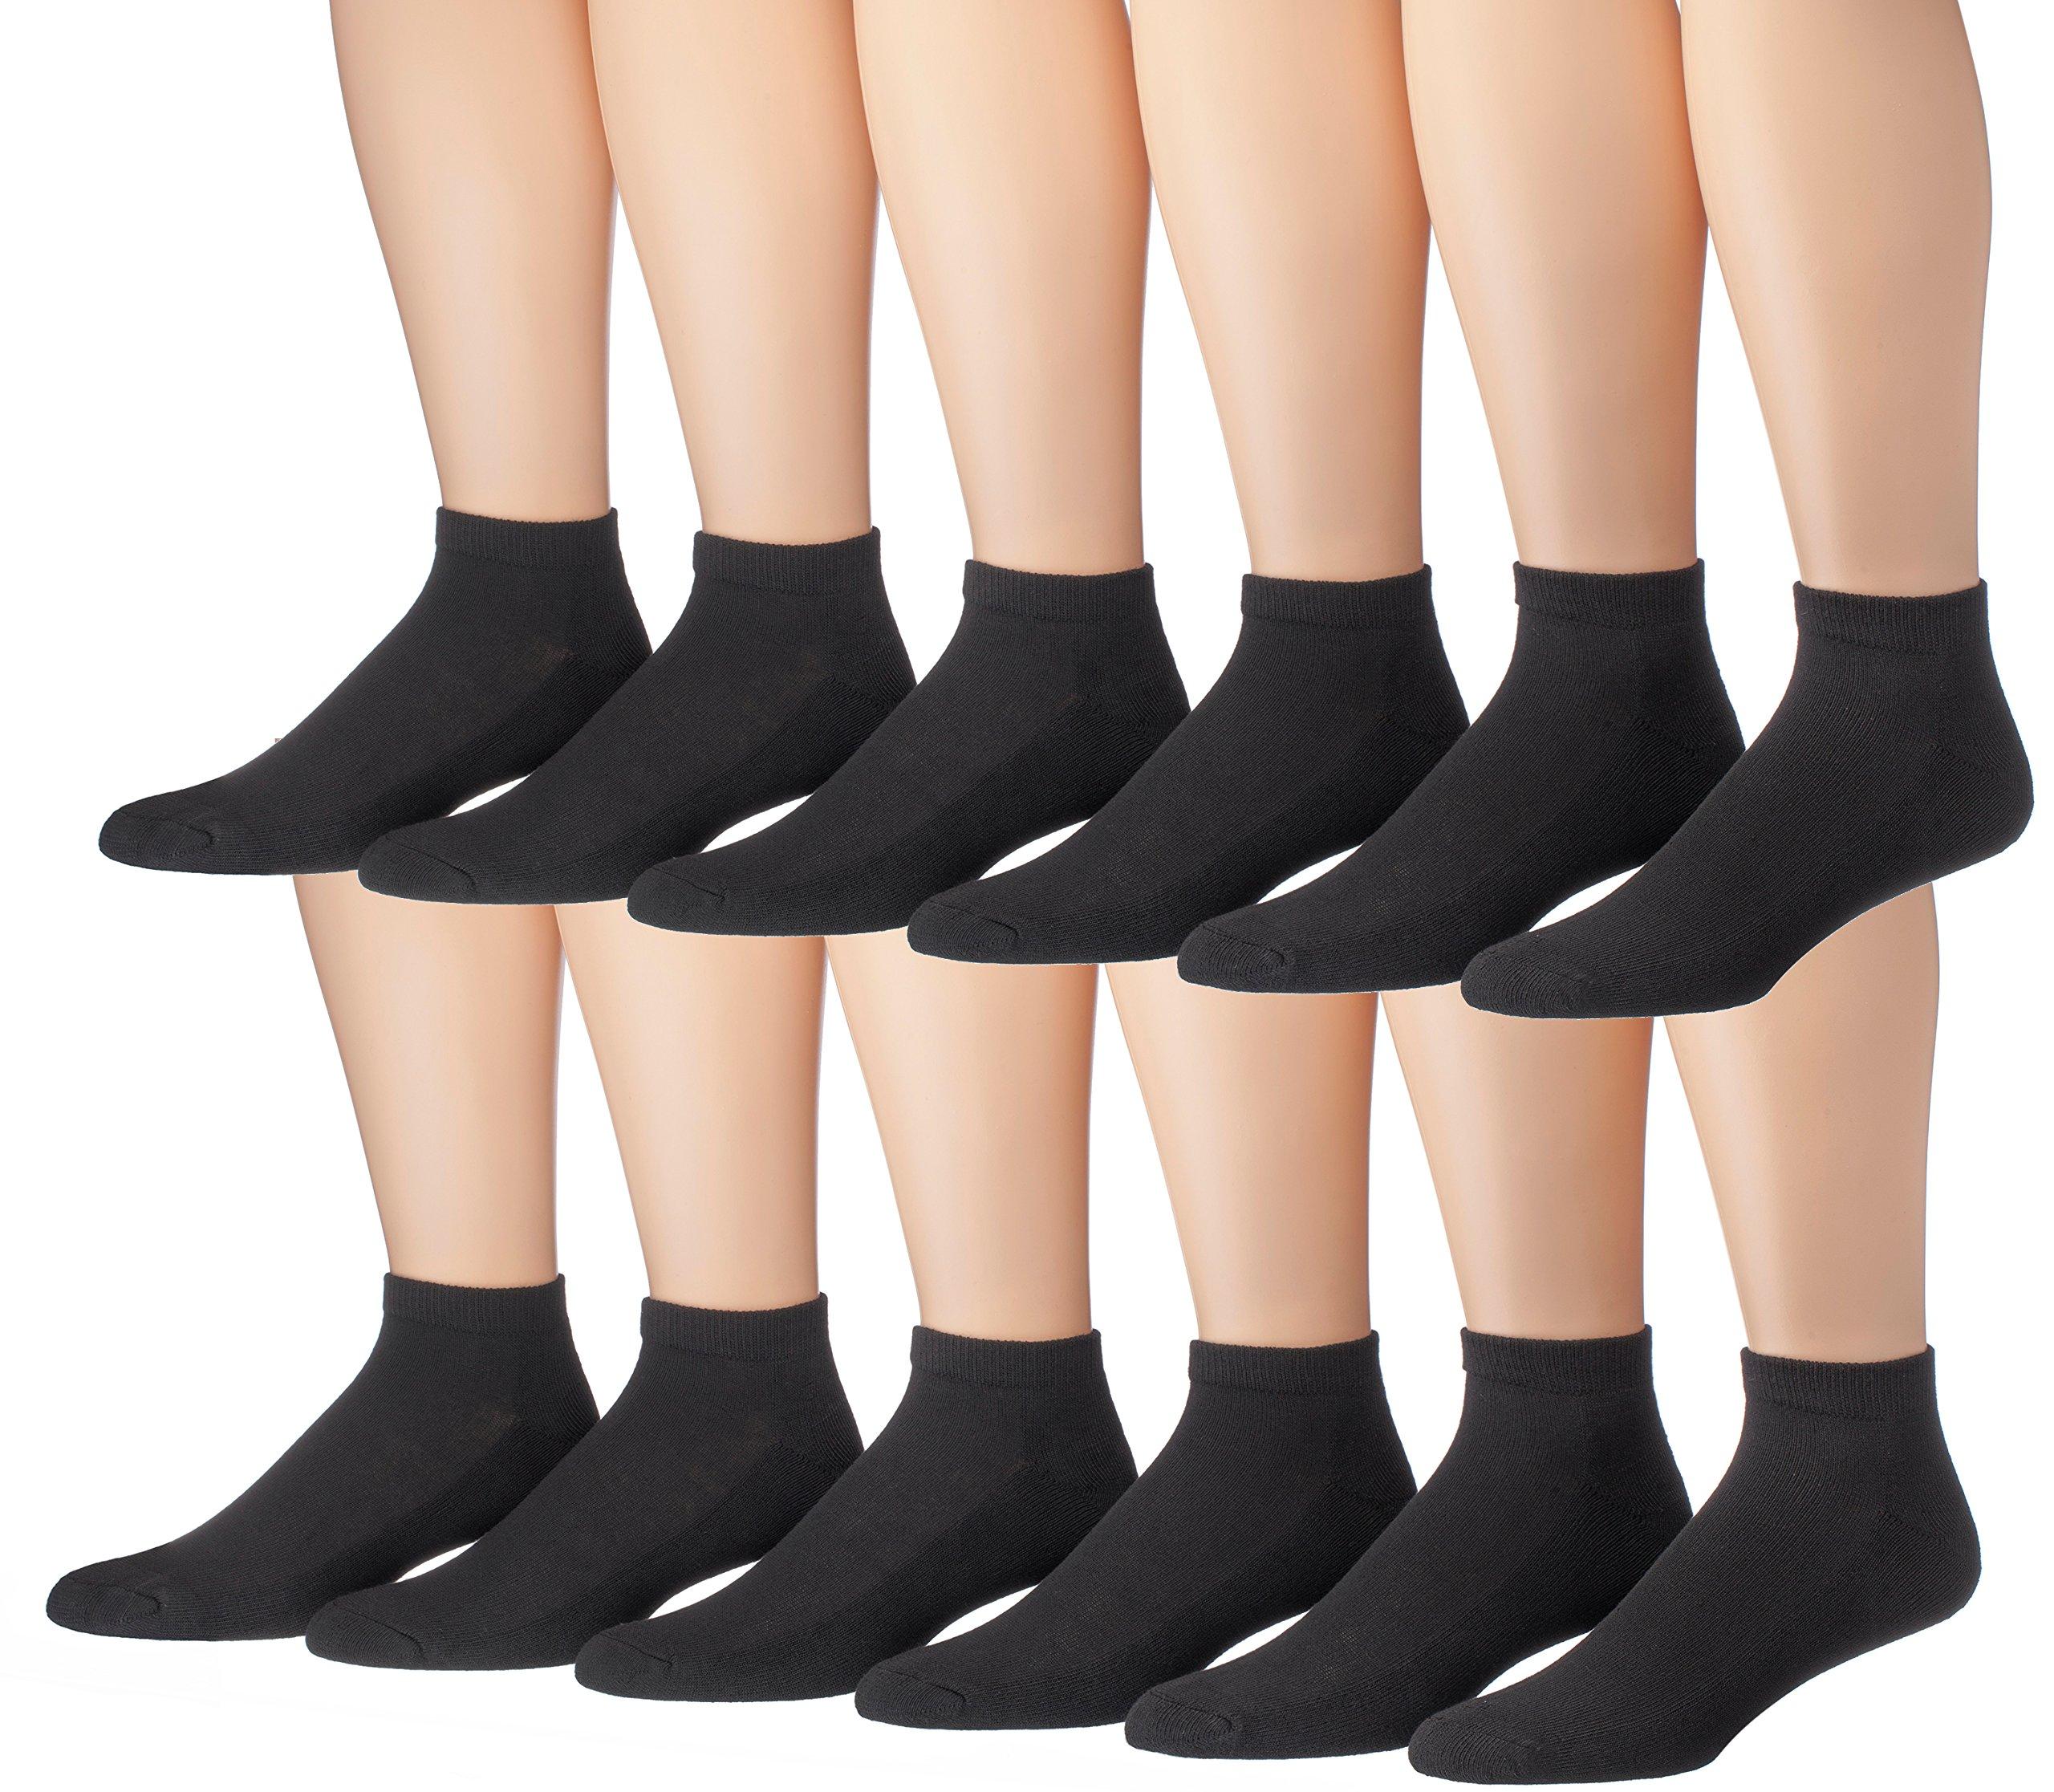 James Fiallo Men's 12-Pairs Low Cut Athletic Socks, (Sock size 10-13) Fits shoe size 6-12, 2902-12